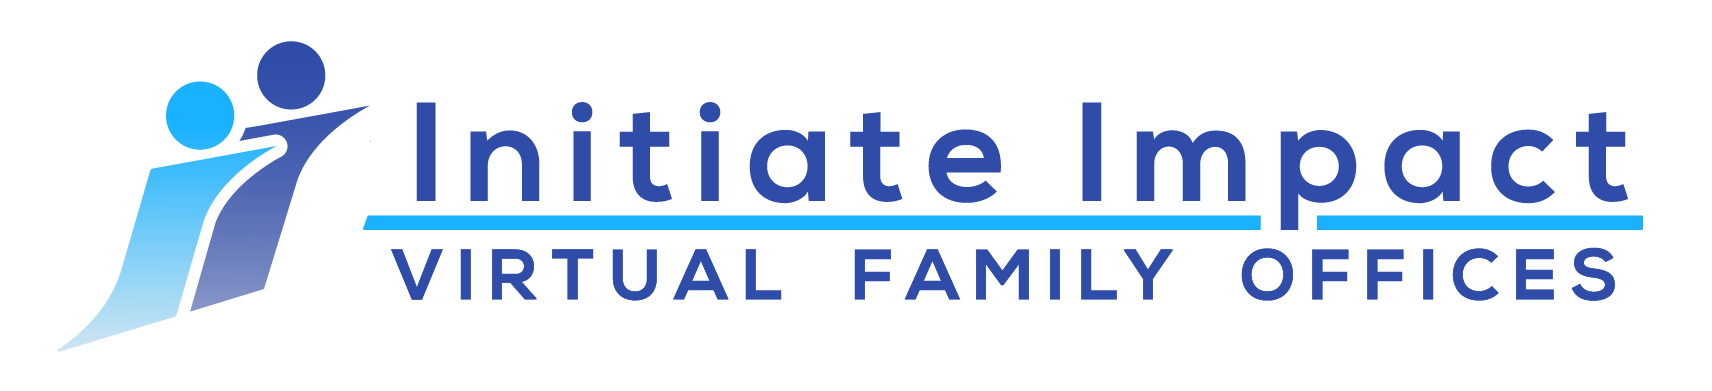 Logo for Initiate Impact